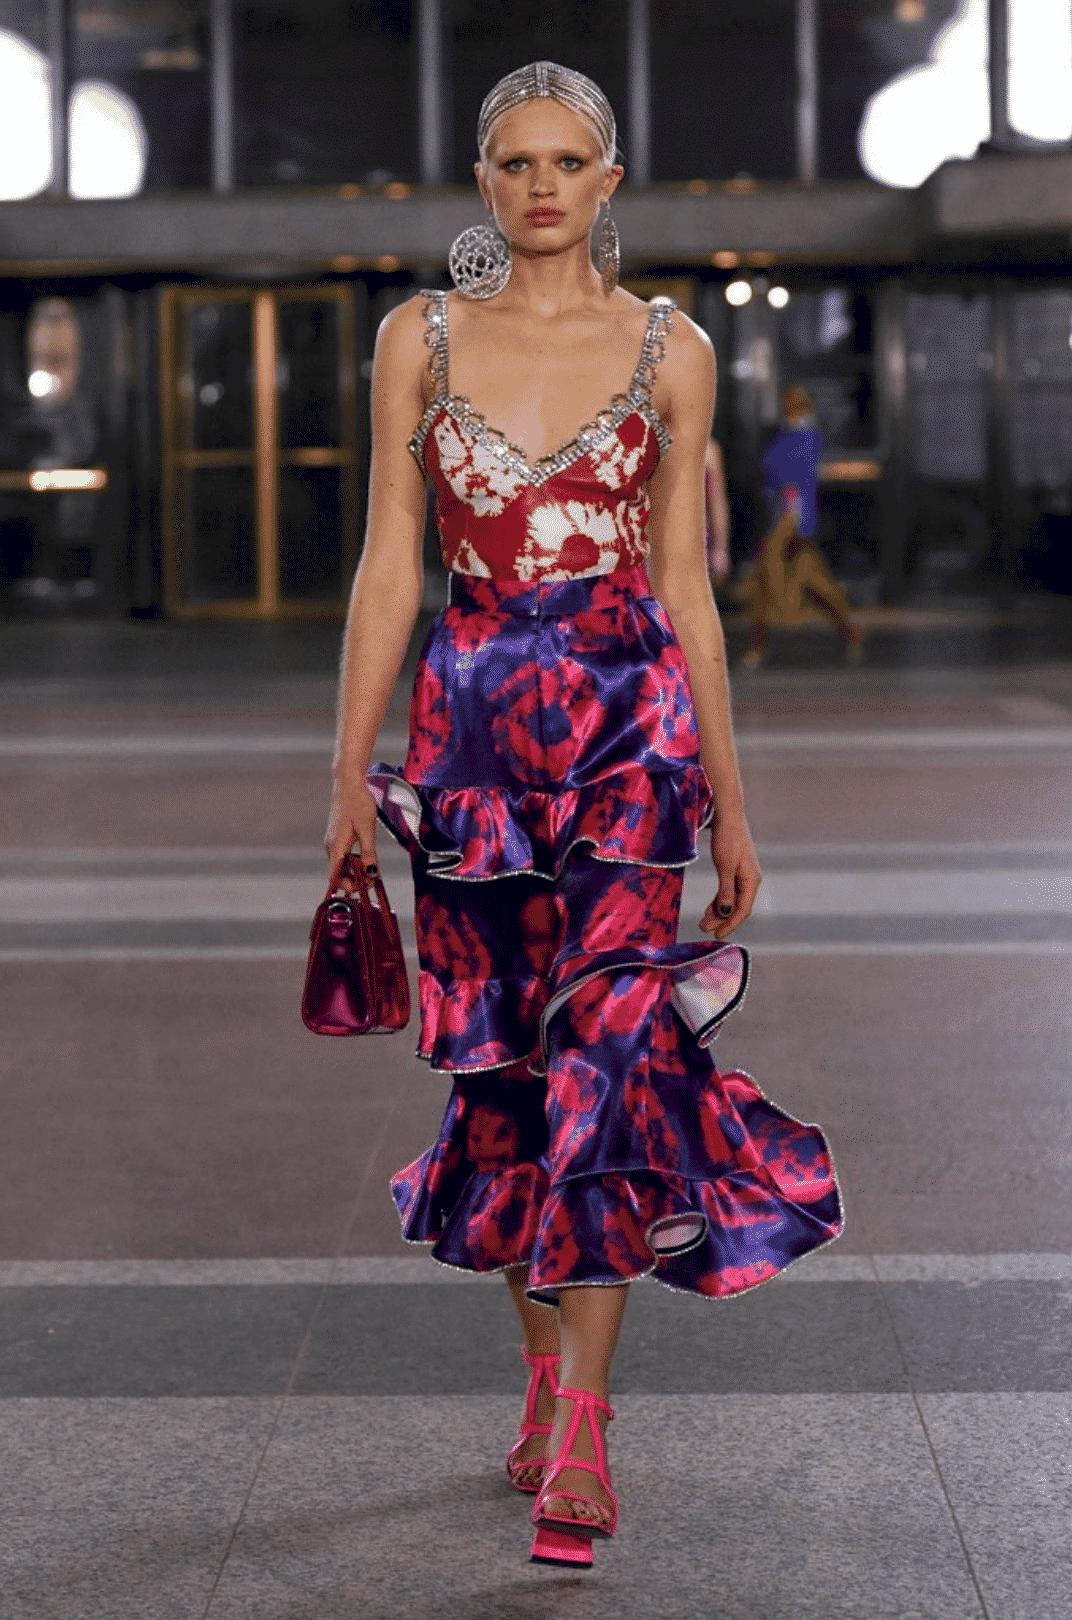 model wearing a tie dye tank top, tie dye midi skirt, and pink heels